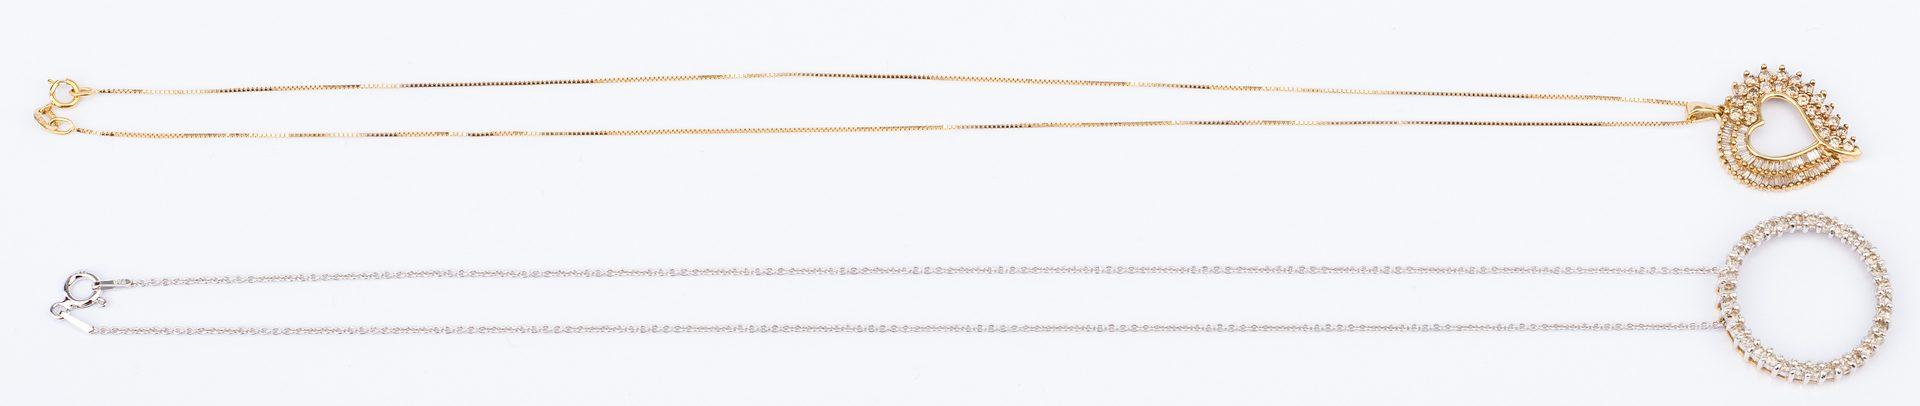 Lot 29: 4 items Ladies Gold, Diamond Jewelry